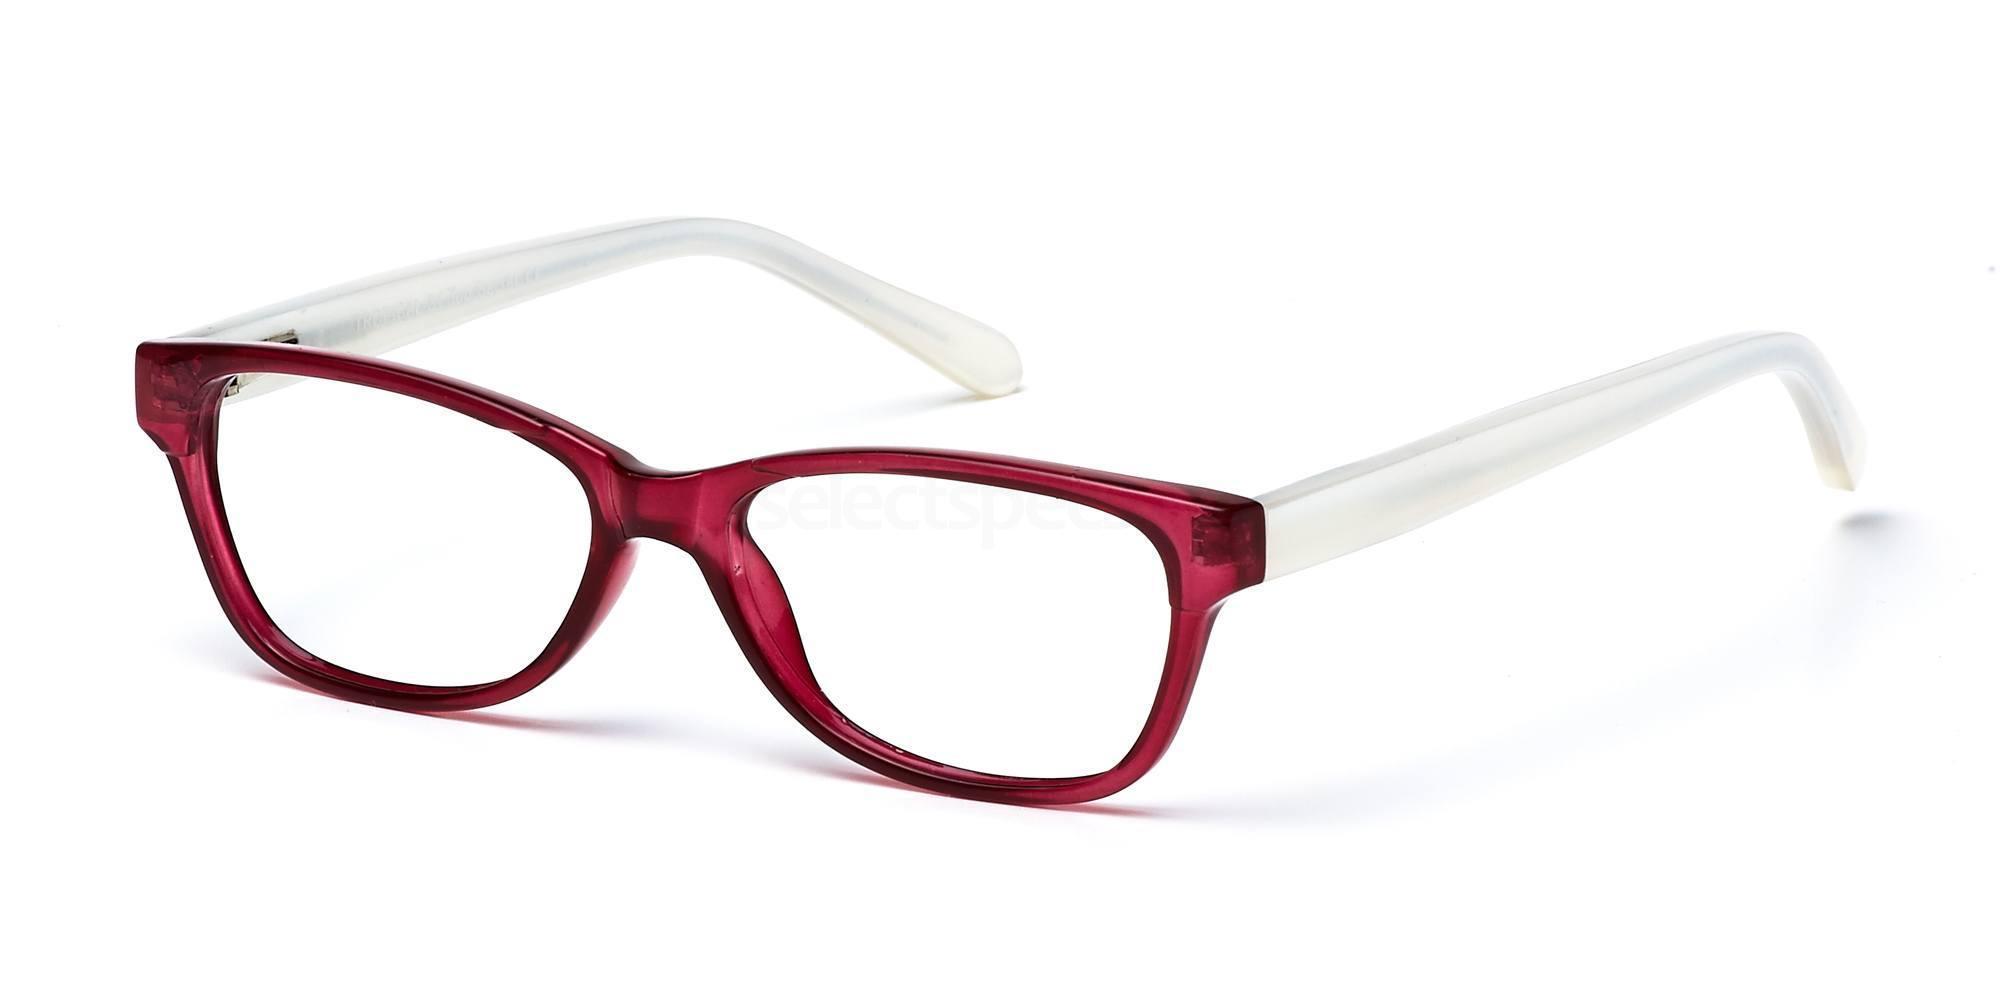 C1 TROPICAL3 Glasses, Top Secret KIDS